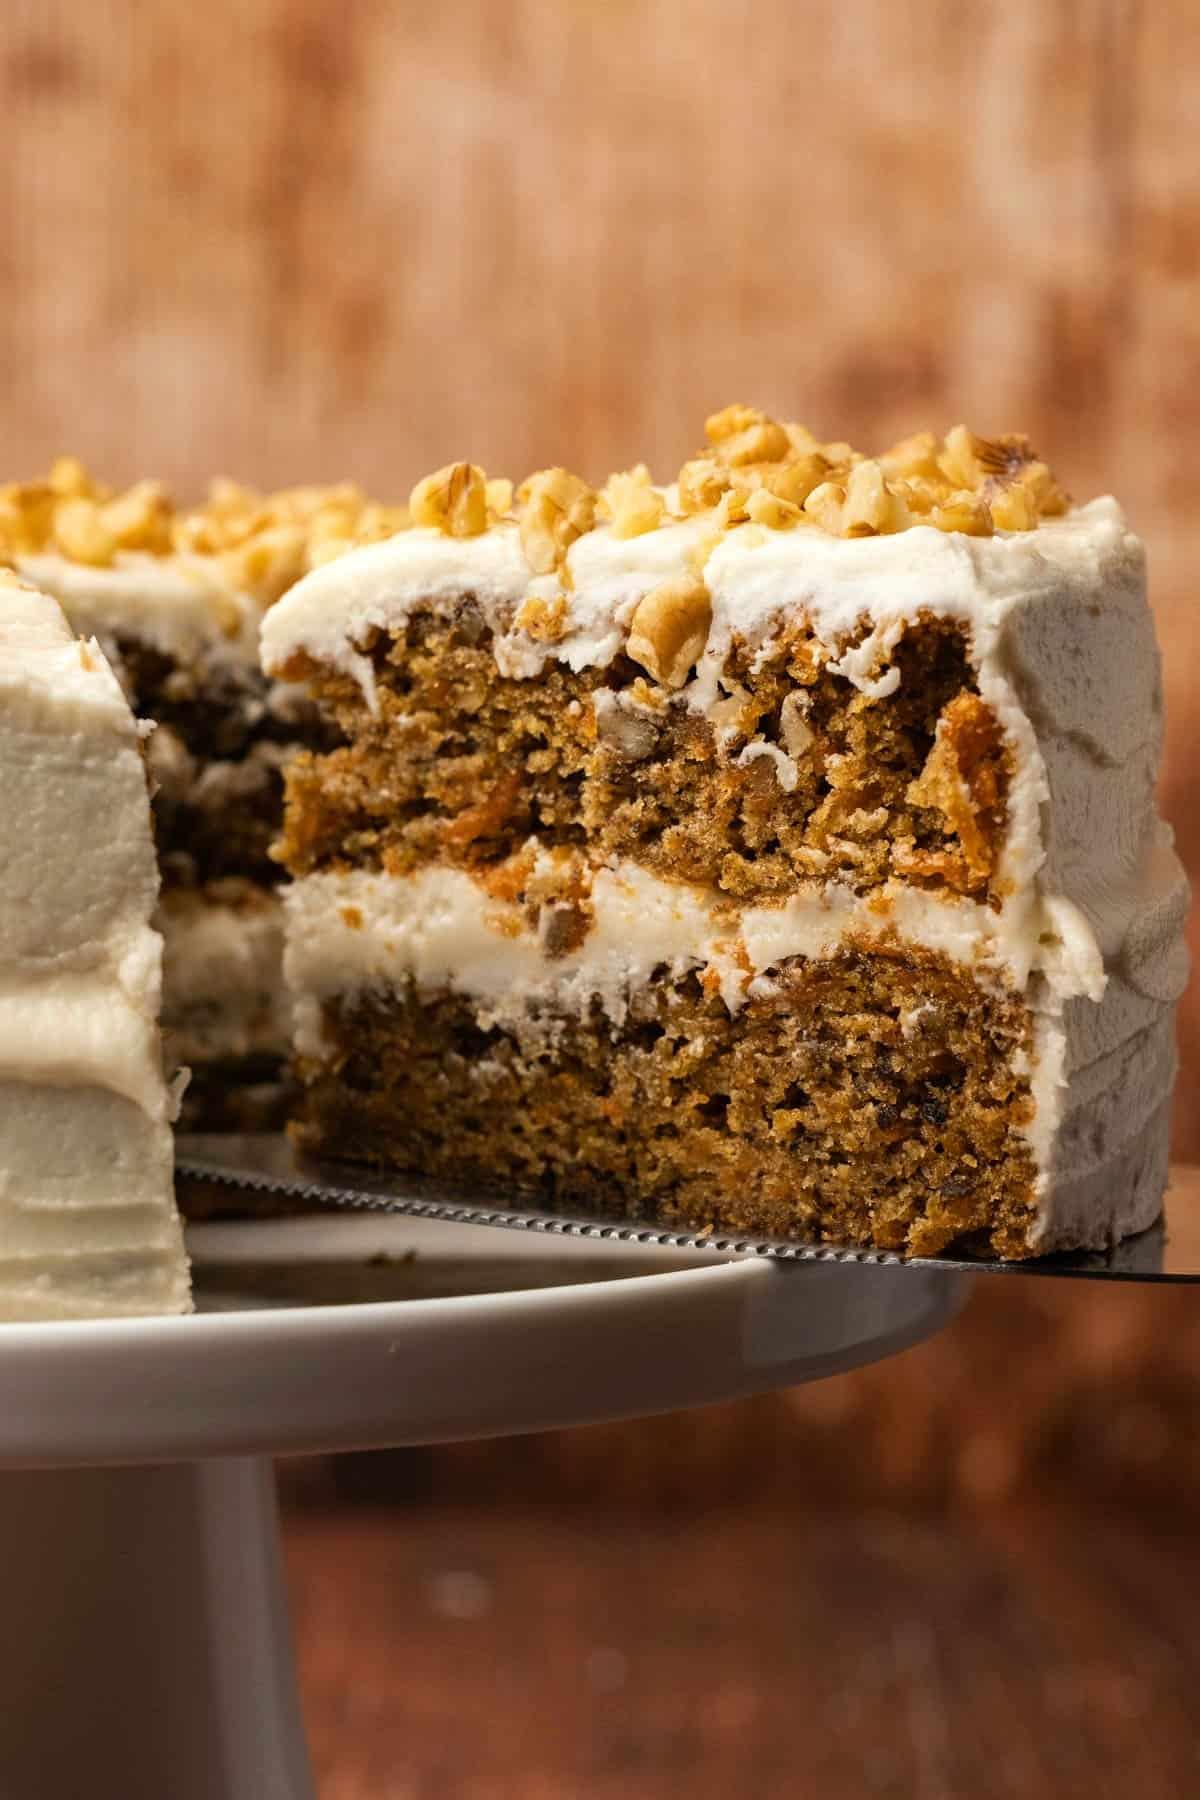 Sliced vegan carrot cake on a white cake stand.